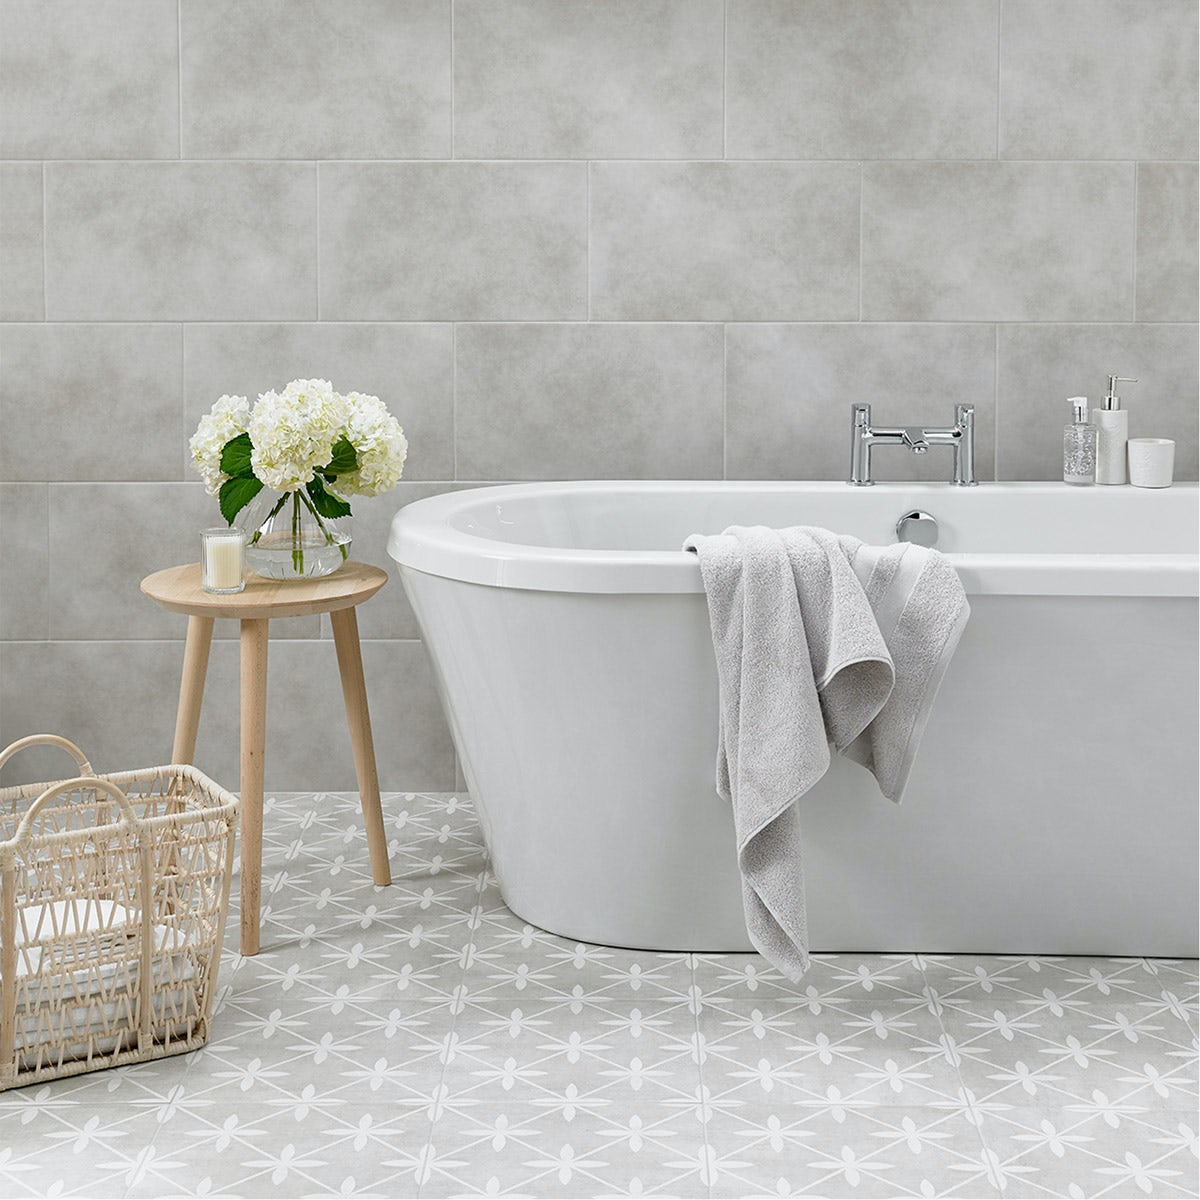 Laura ashley plain dove grey wall floor tile 298mm x 498mm laura ashley plain dove grey wall floor tile 298mm x 498mm doublecrazyfo Image collections